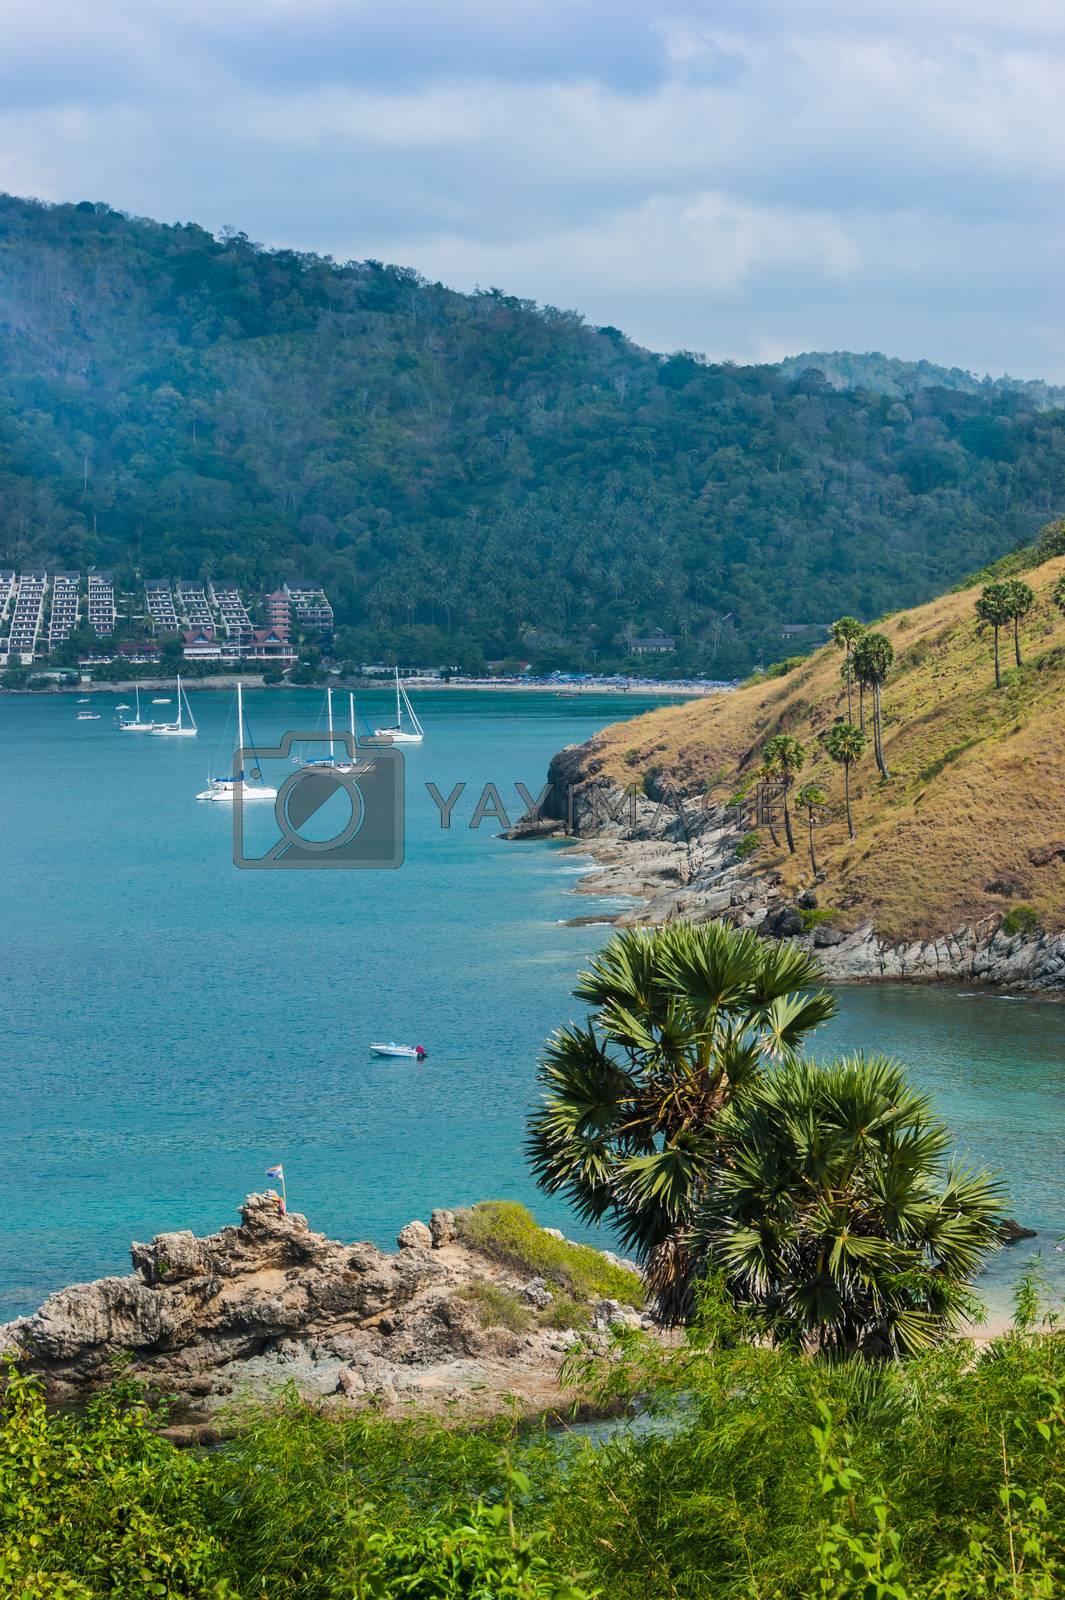 Royalty free image of Beautiful view of Phuket island by oleg_zhukov